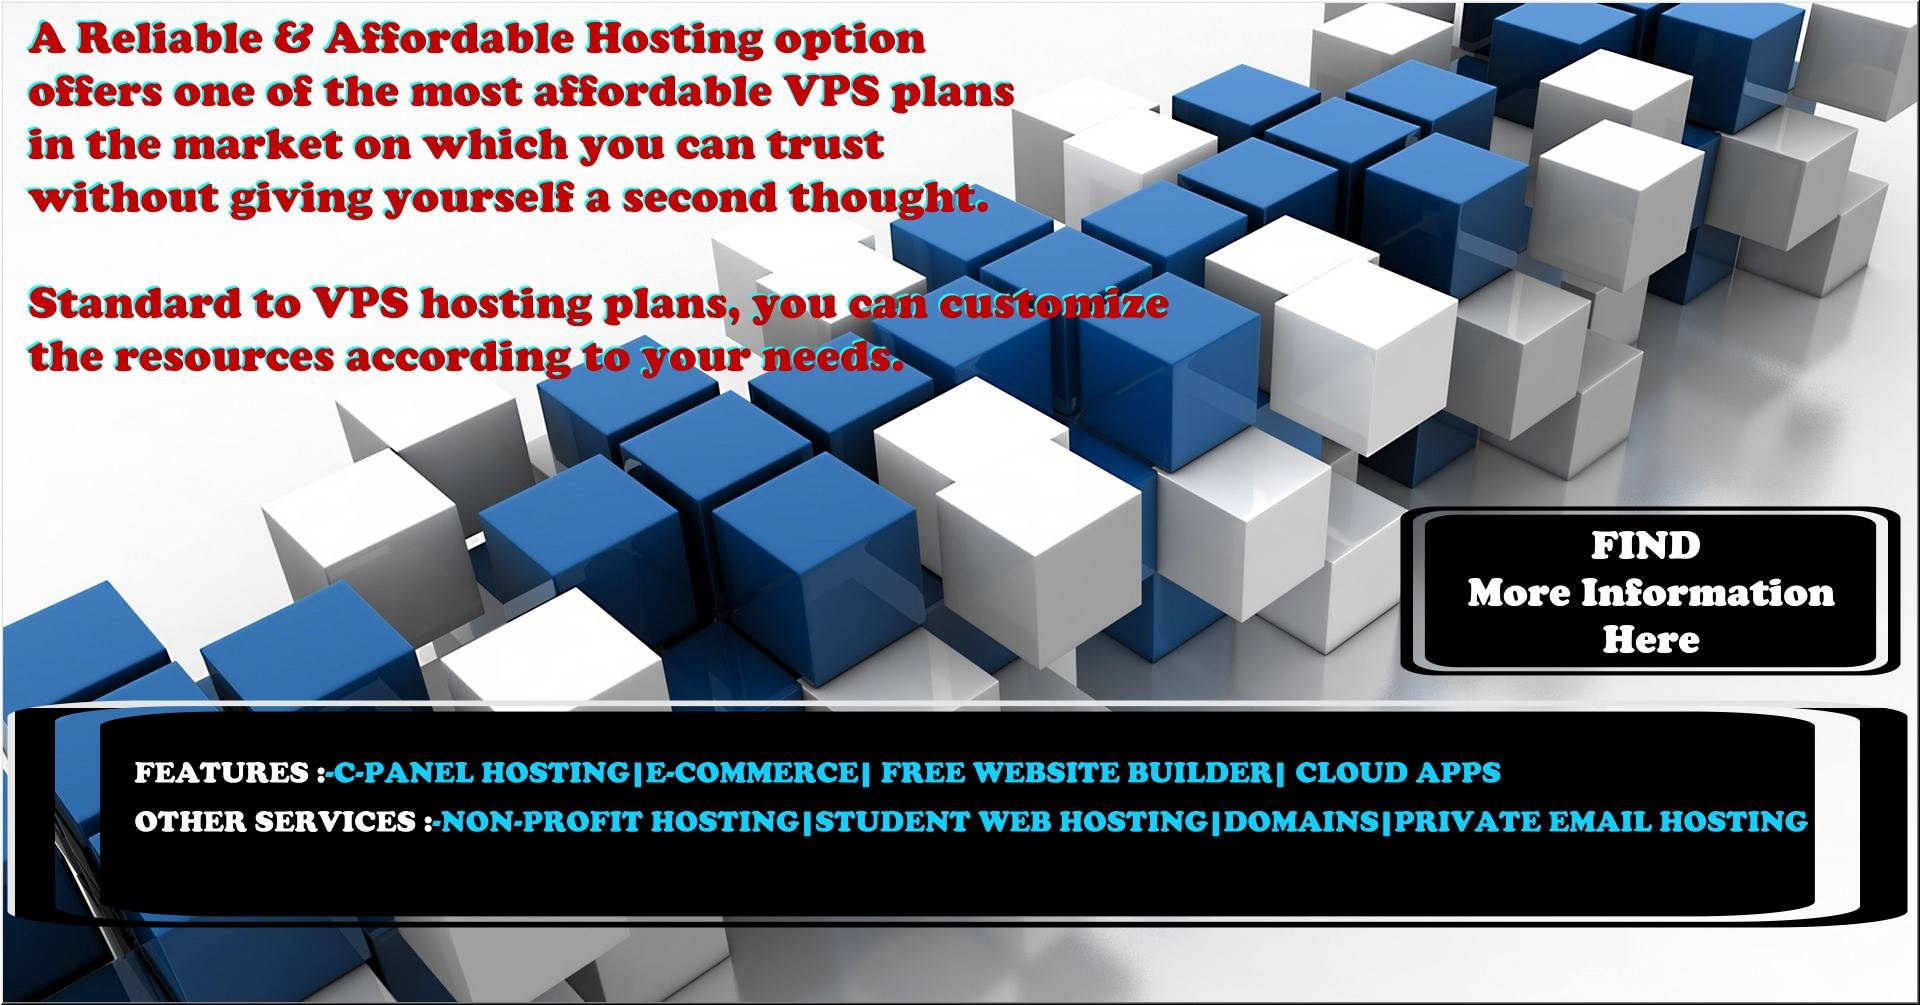 TruWebHosting - Interserver.net Reliable & Affordable Hosting Service 65% Off Plans